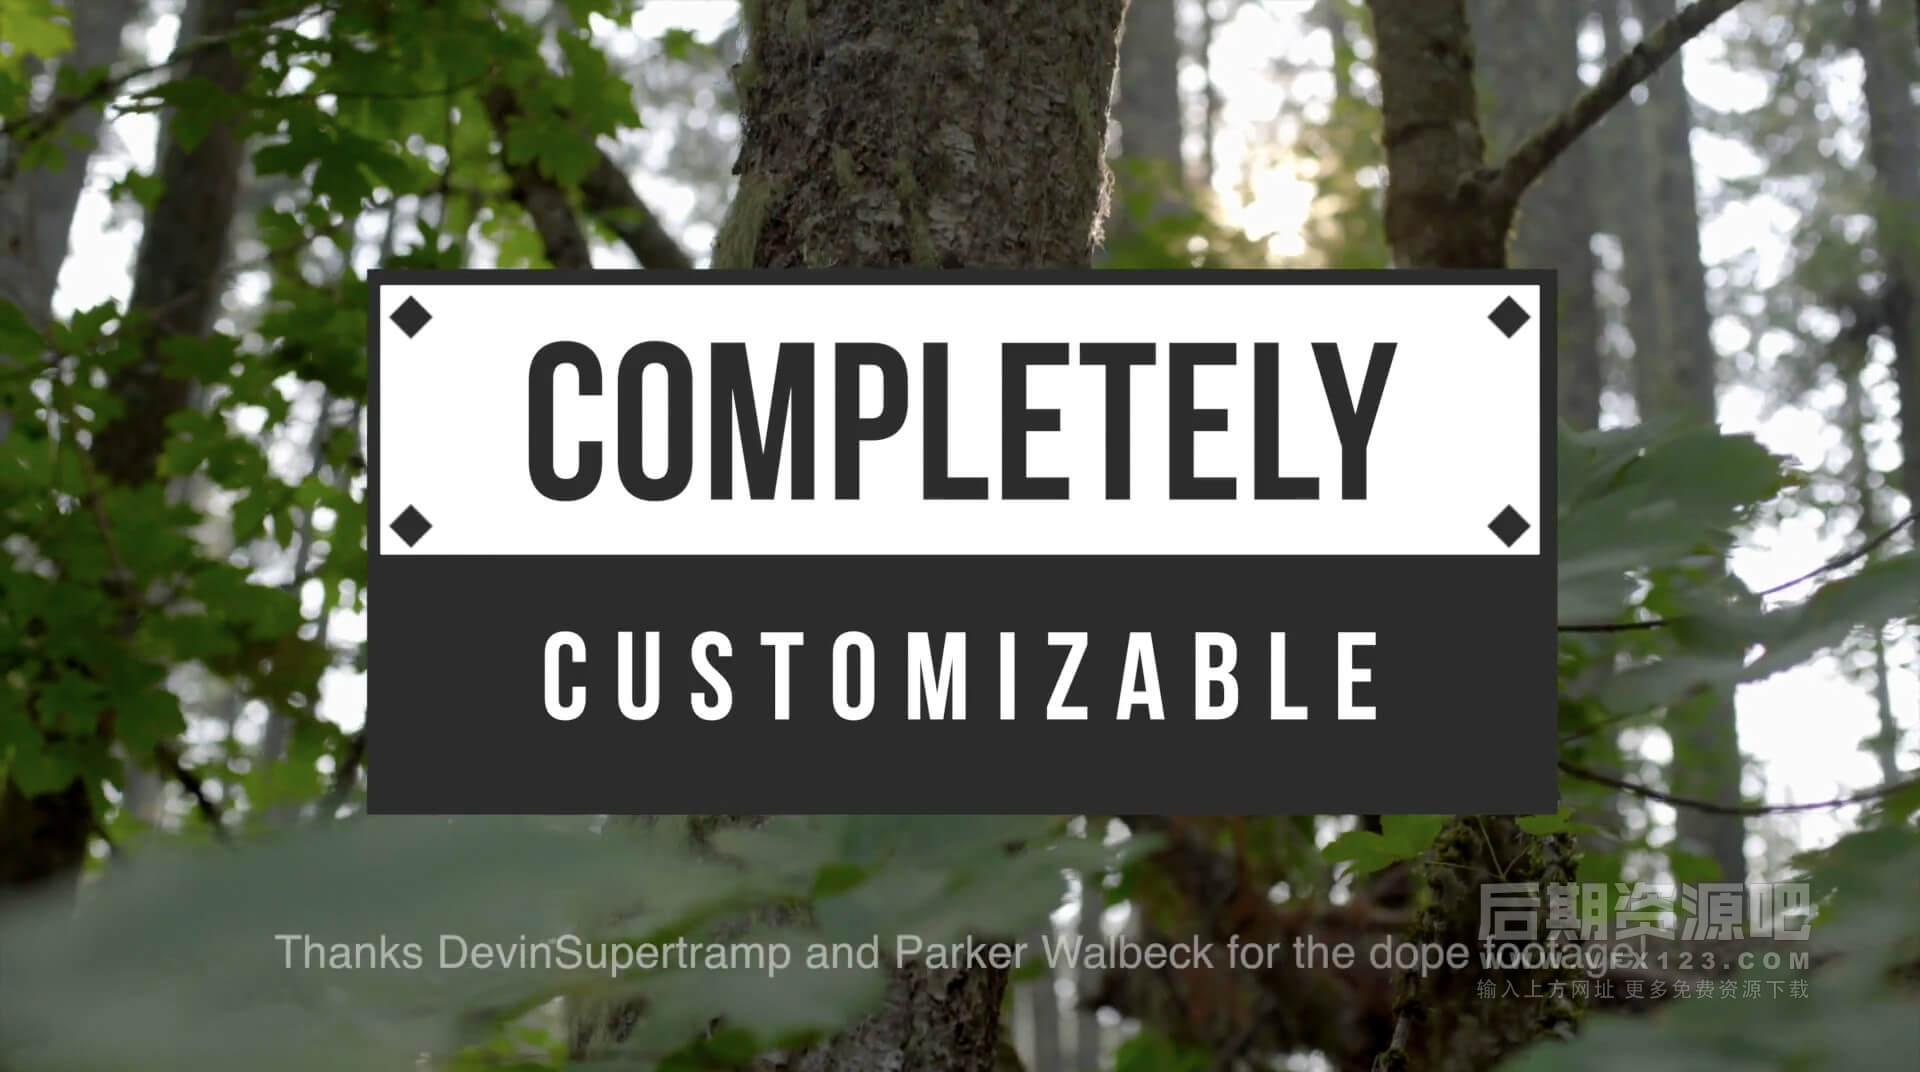 Fcpx插件 27组简约大字封面标题模板 Stupid Raisins Simple Pop